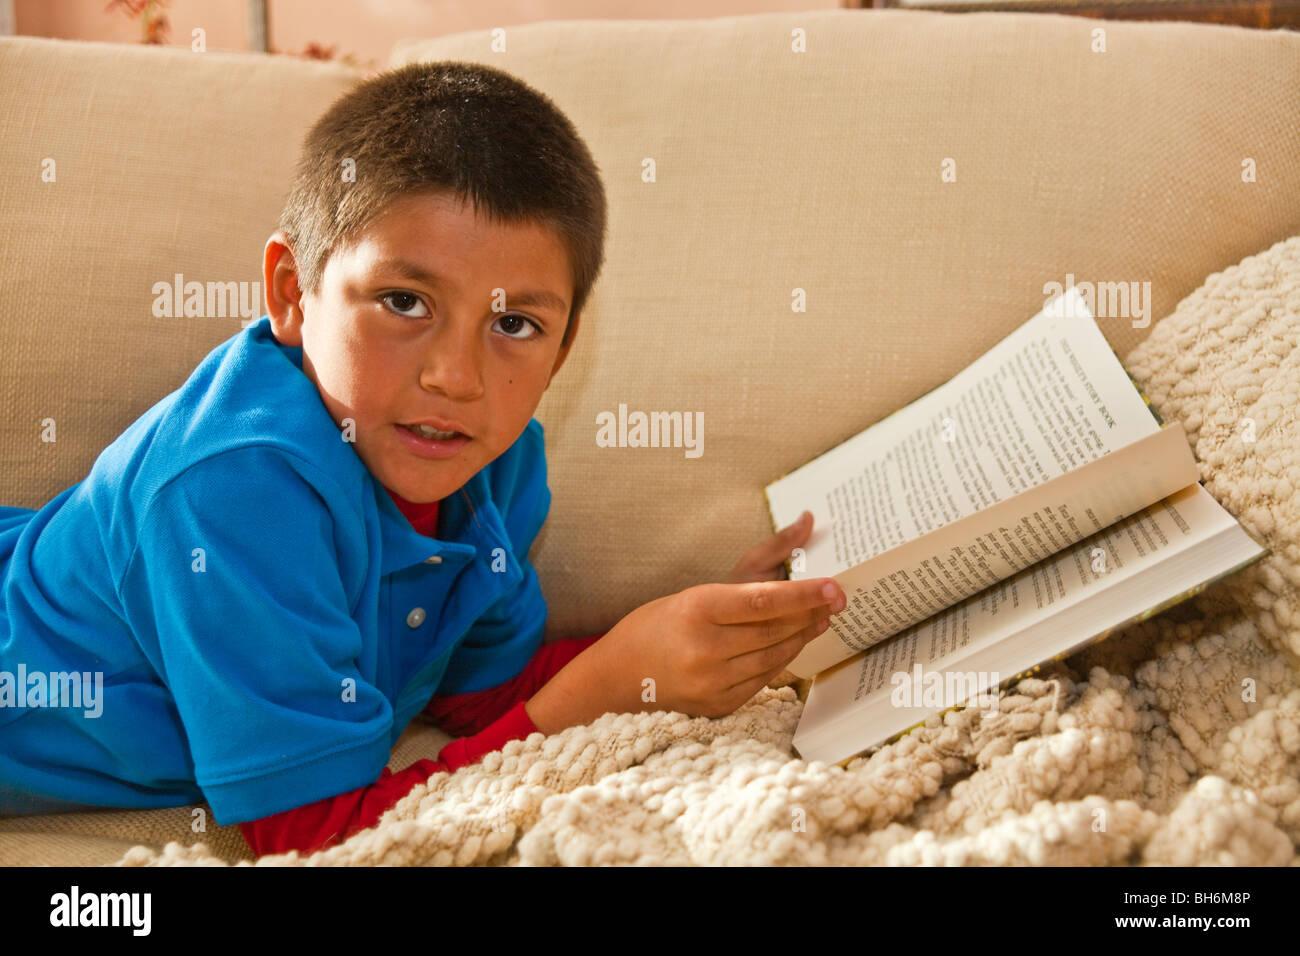 Hispanic 8-9 year old boy reading a book on sofa . United States, eye contact, rainy day activity POV MR United - Stock Image